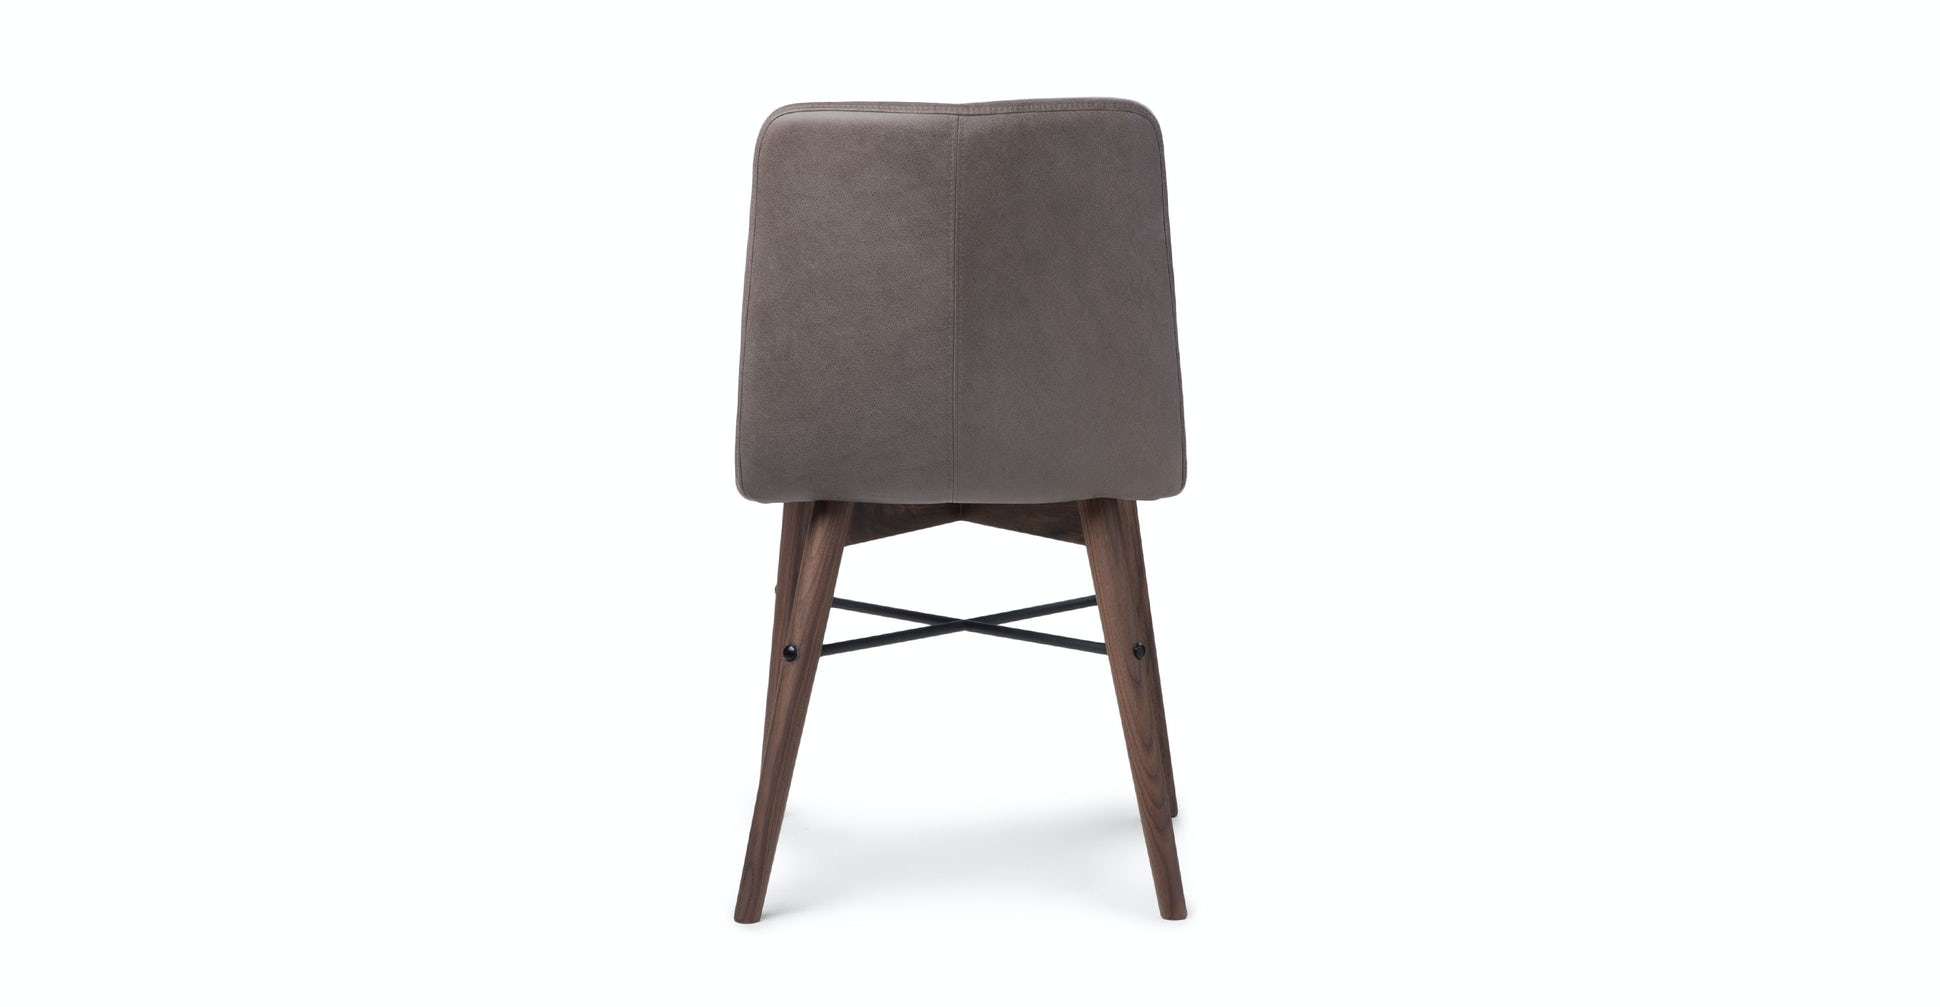 Kissa Canyon Charcoal Matte Walnut Dining Chair, set of 2